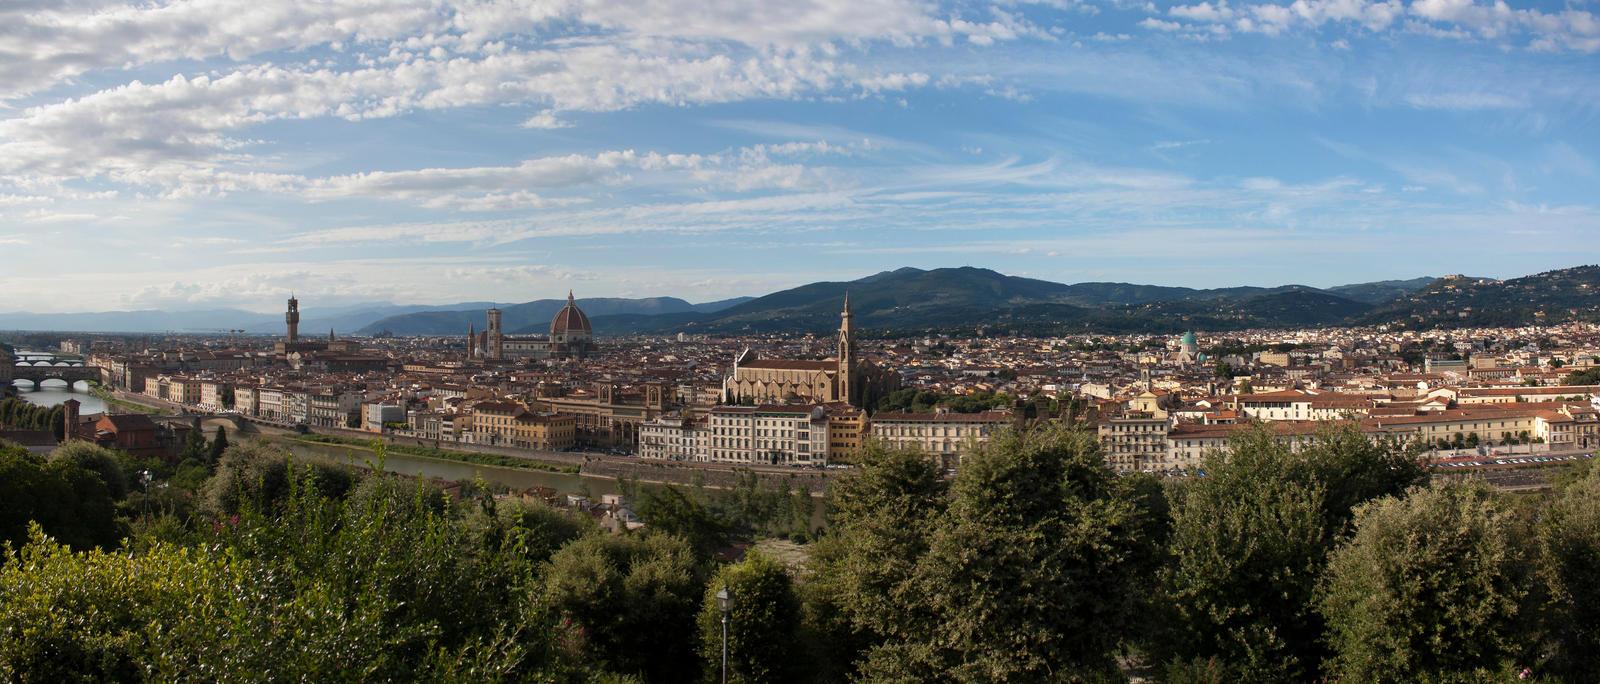 Firenze - Panorama by k4muii